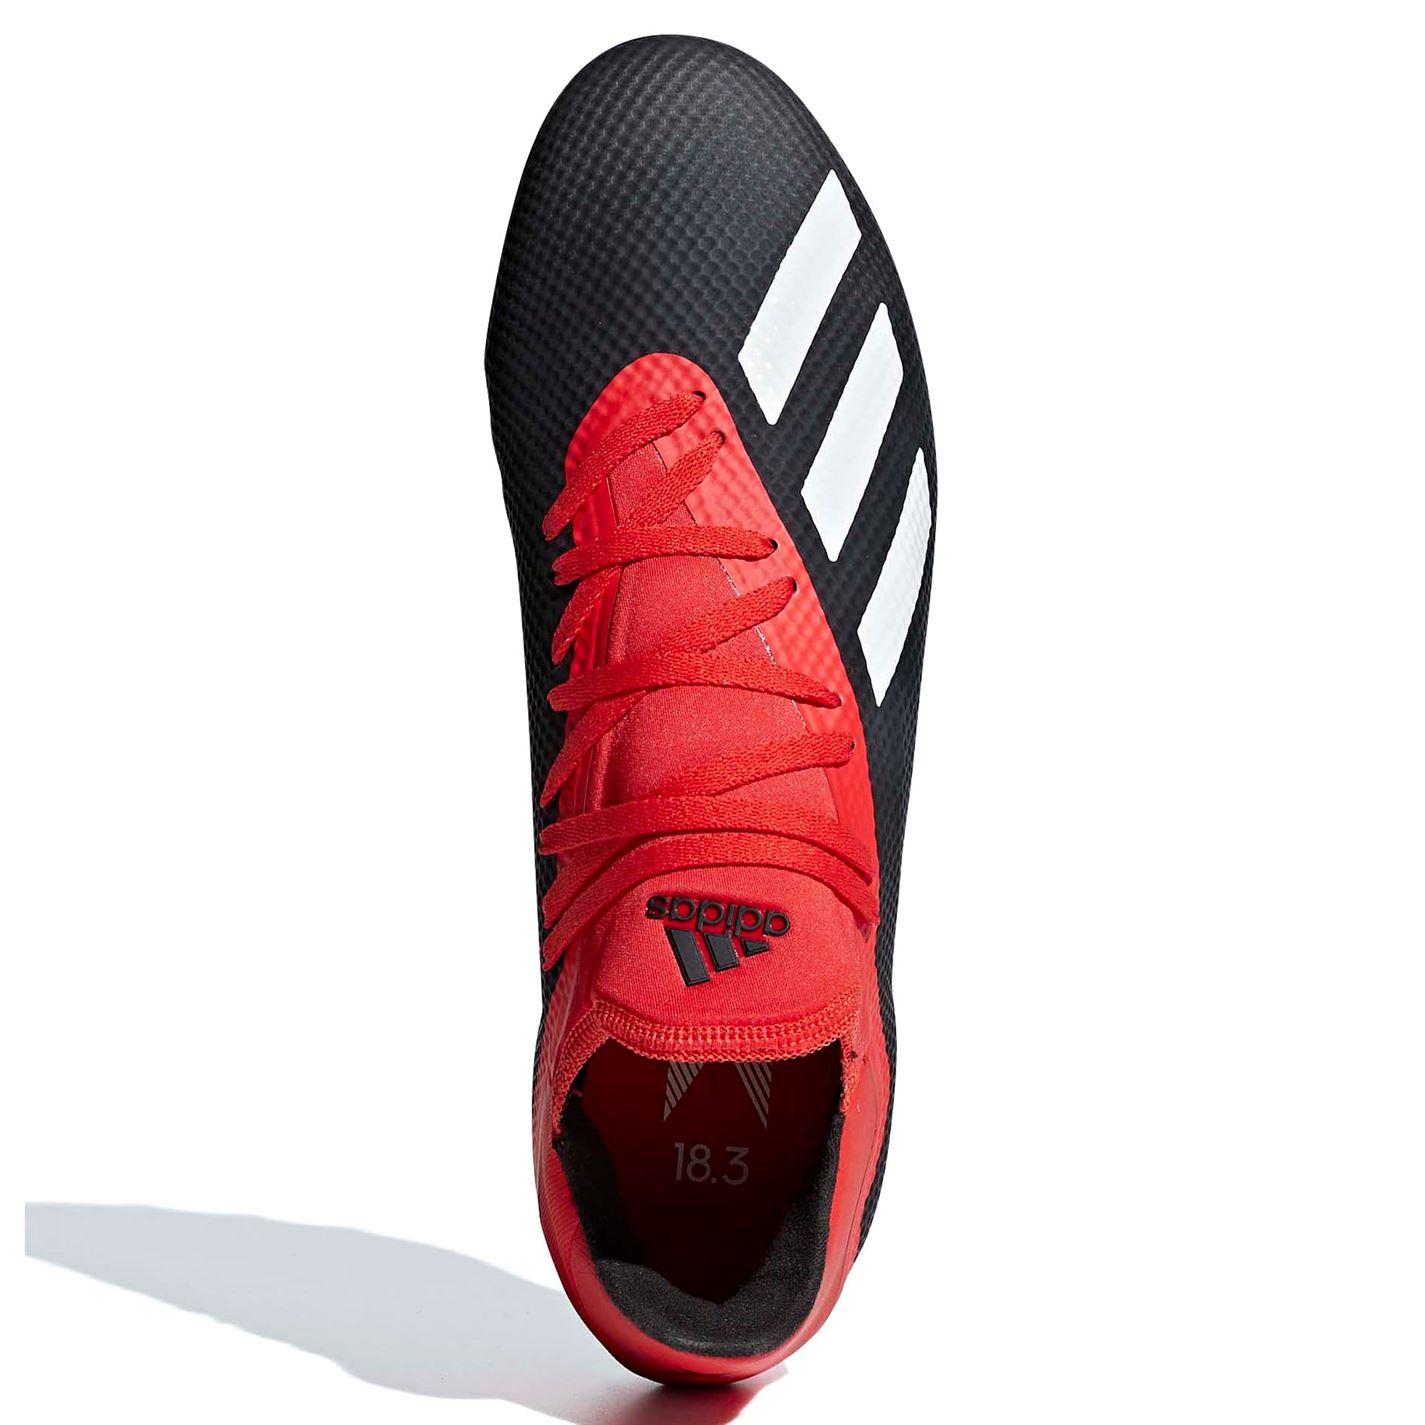 Adidas Mens X X X 18.3 AG Football Stiefel Firm Ground Lace Up Lightweight Mesh Upper ddd9b2